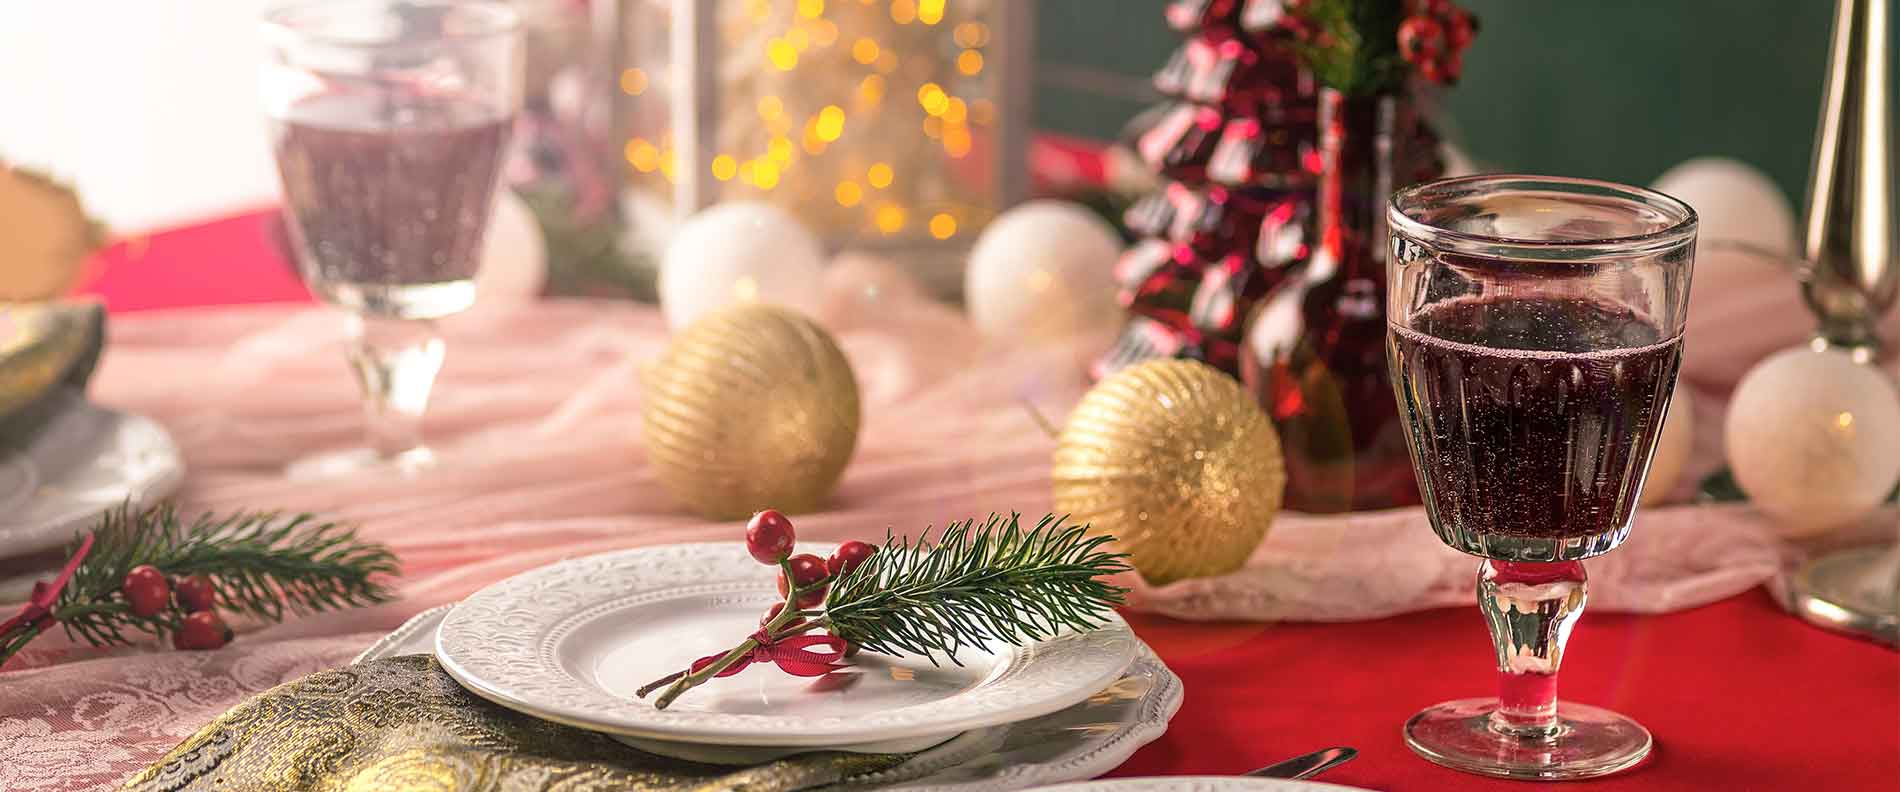 Quoi mettre sur la table de Noël ?